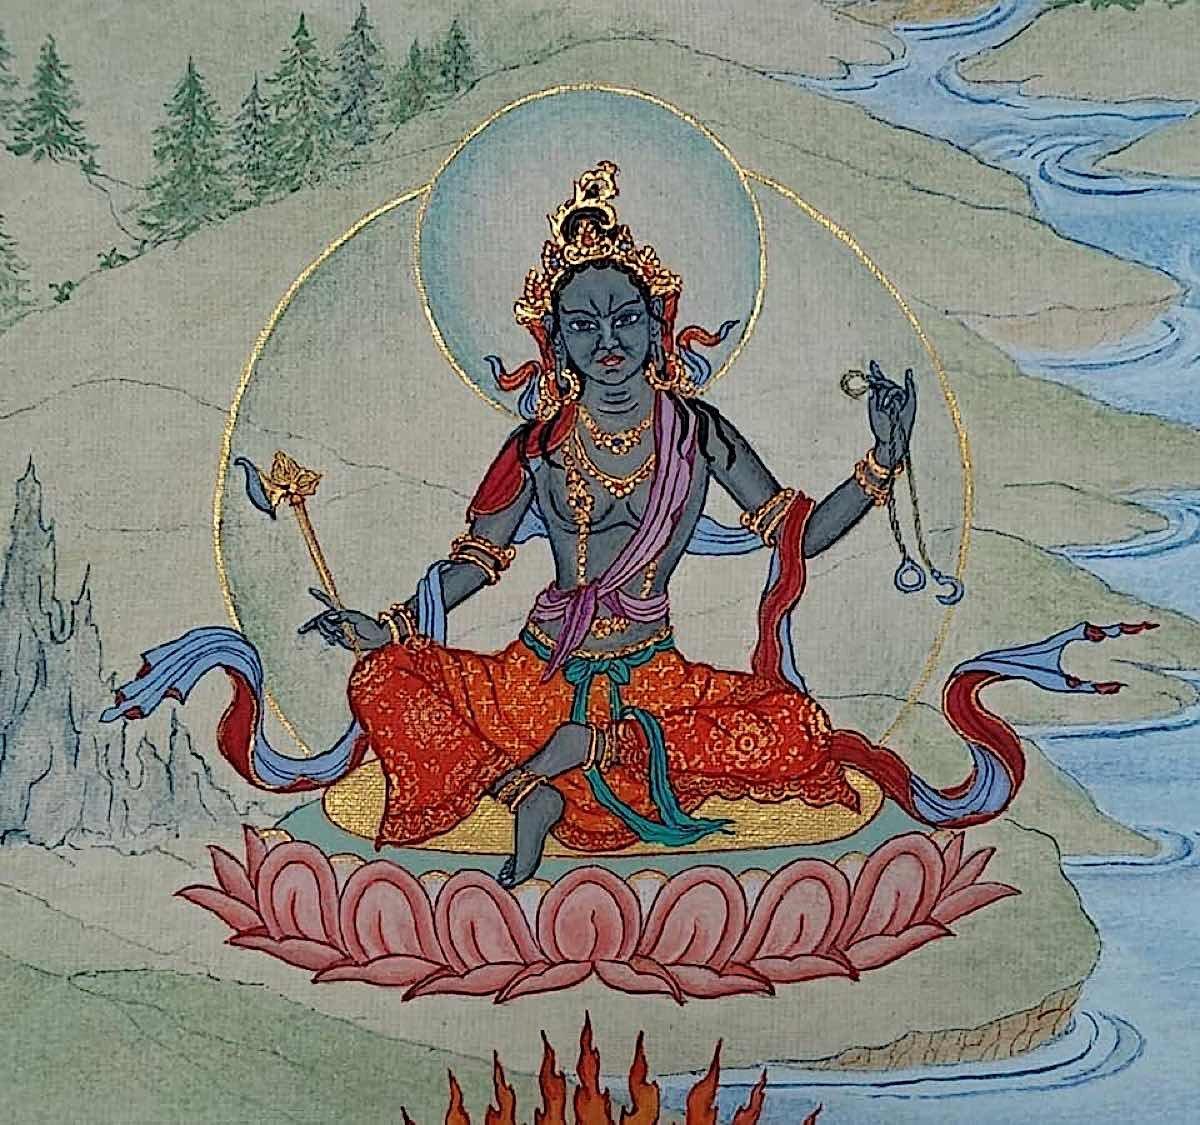 Buddha Weekly 11 Tara Summoner of All Beings Dispeller of Misfortune Jagad Vasi Vipan Nirbarhana Tara 21 Taras Thankha by Angeli Lhadripa Shkonda Buddhism